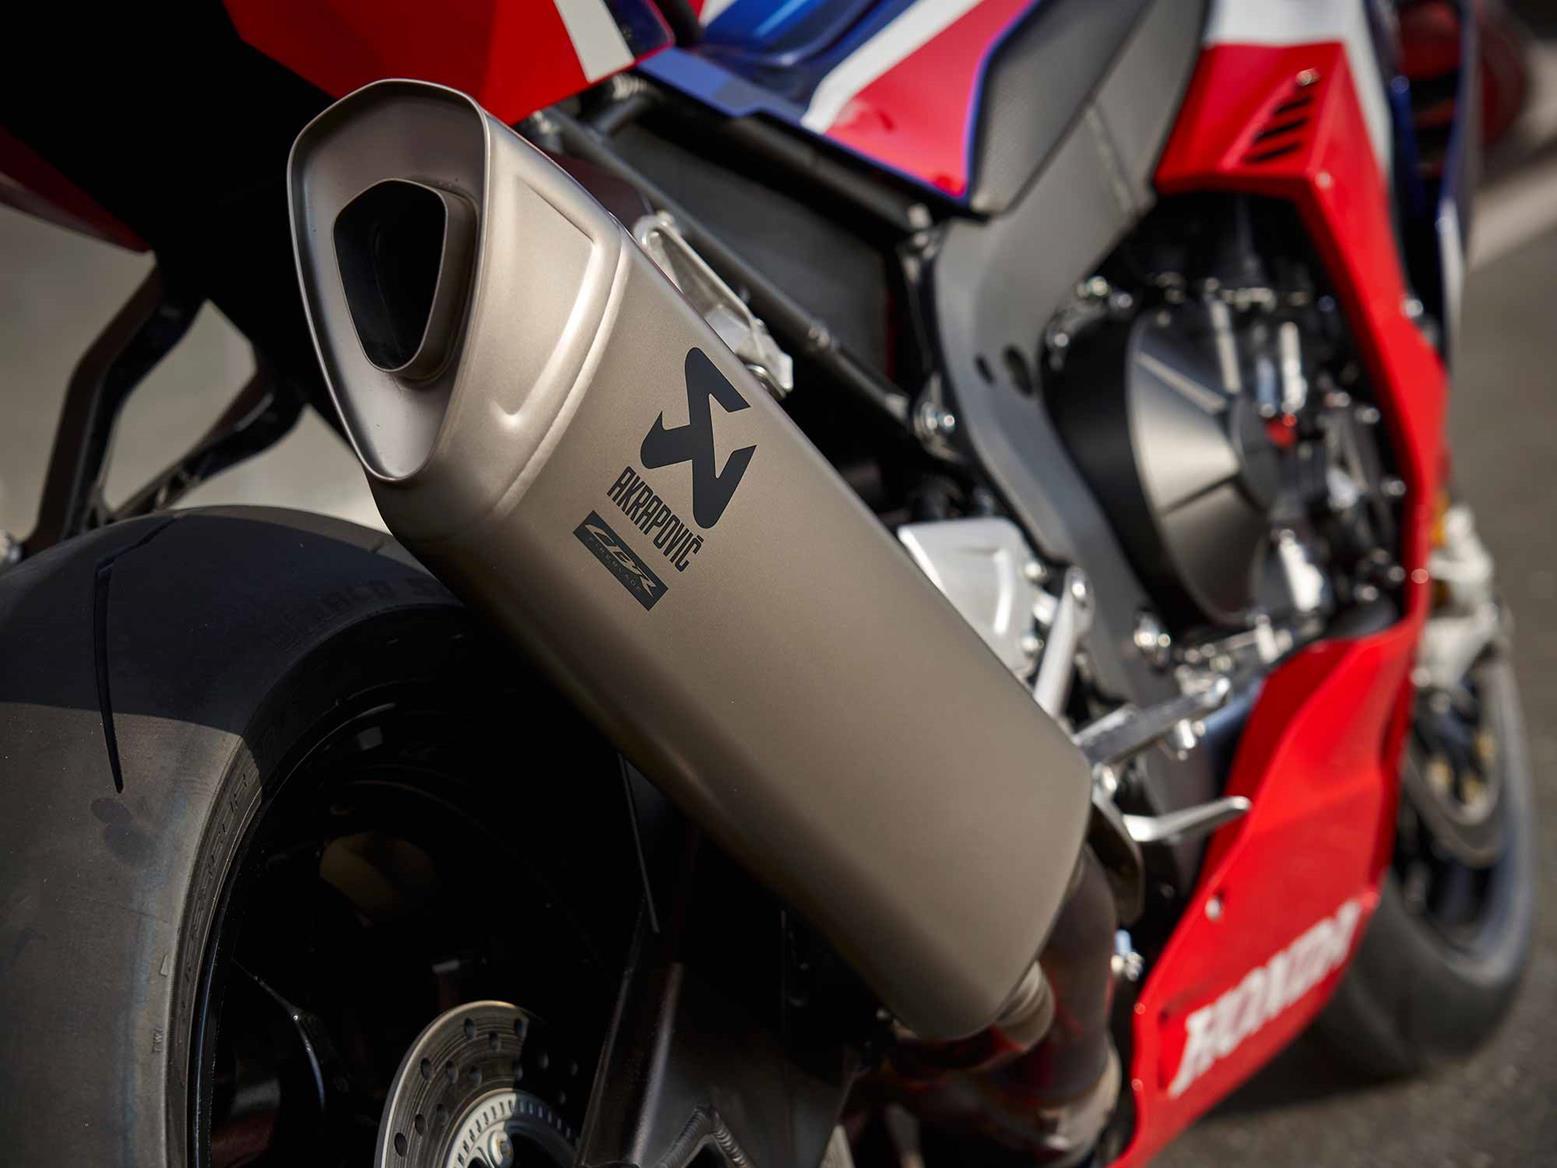 Honda CBR1000RR-R Fireblade SP exhaust